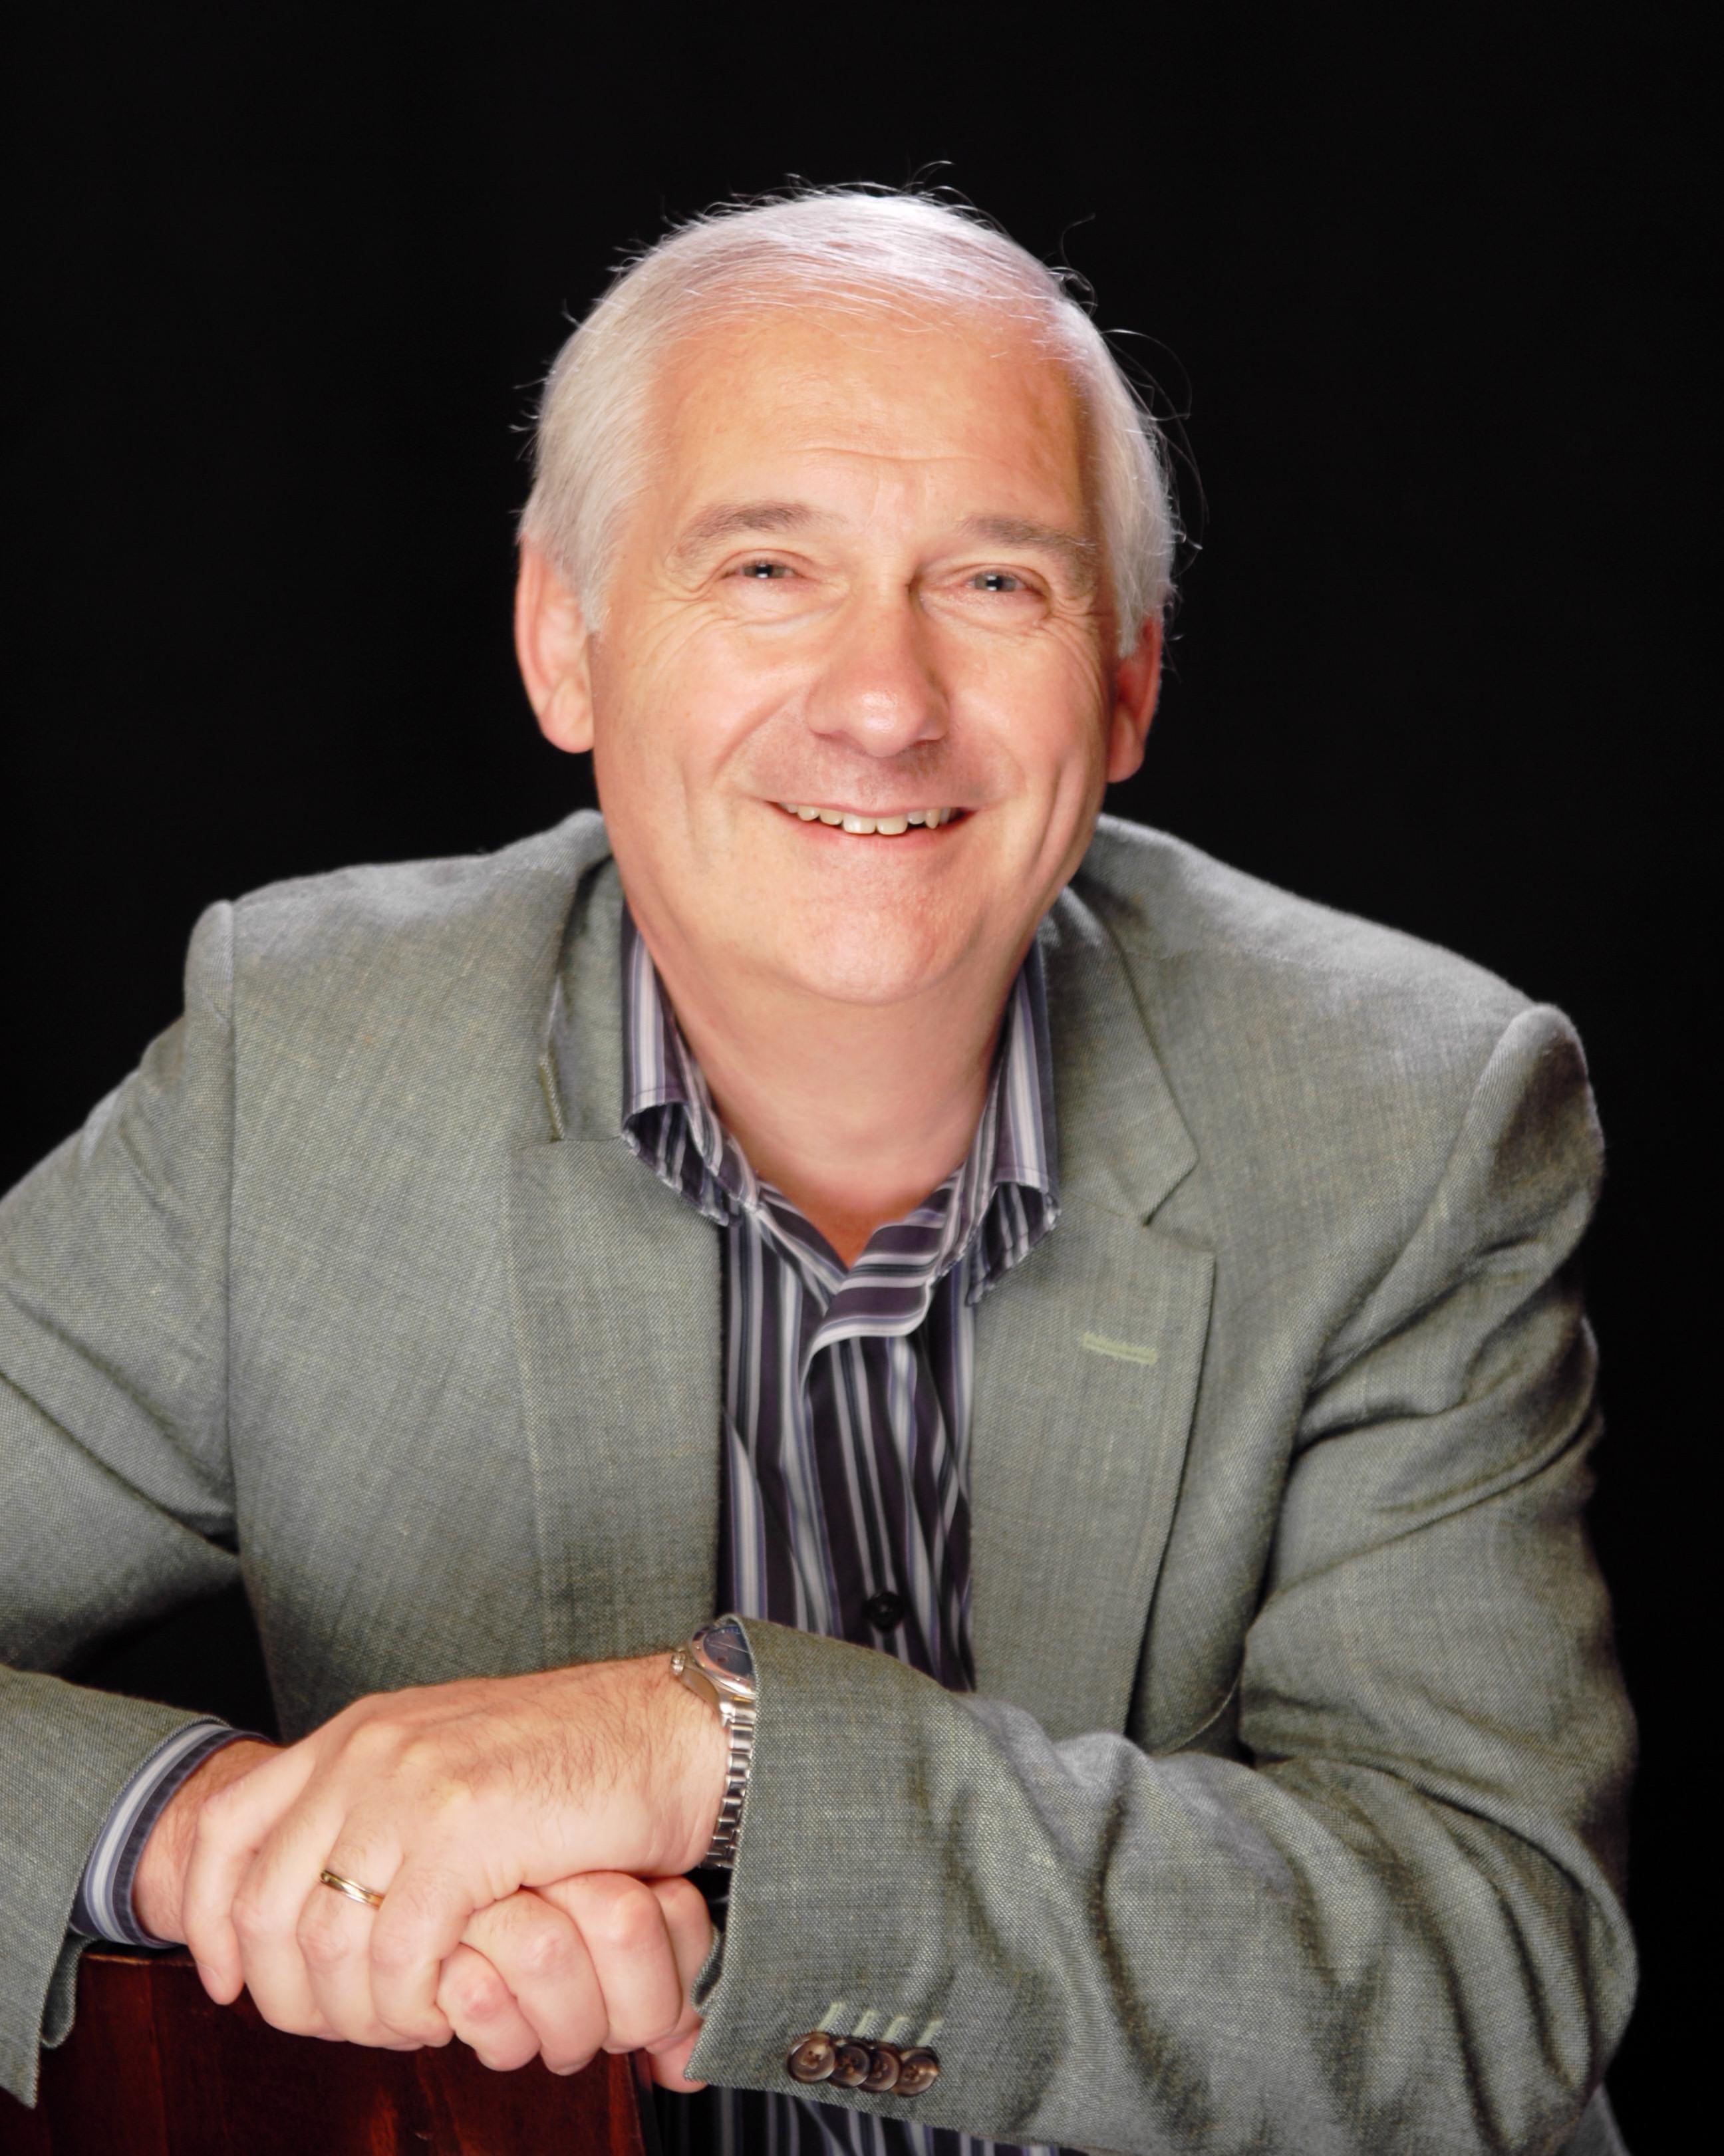 Mark Lloydbottom